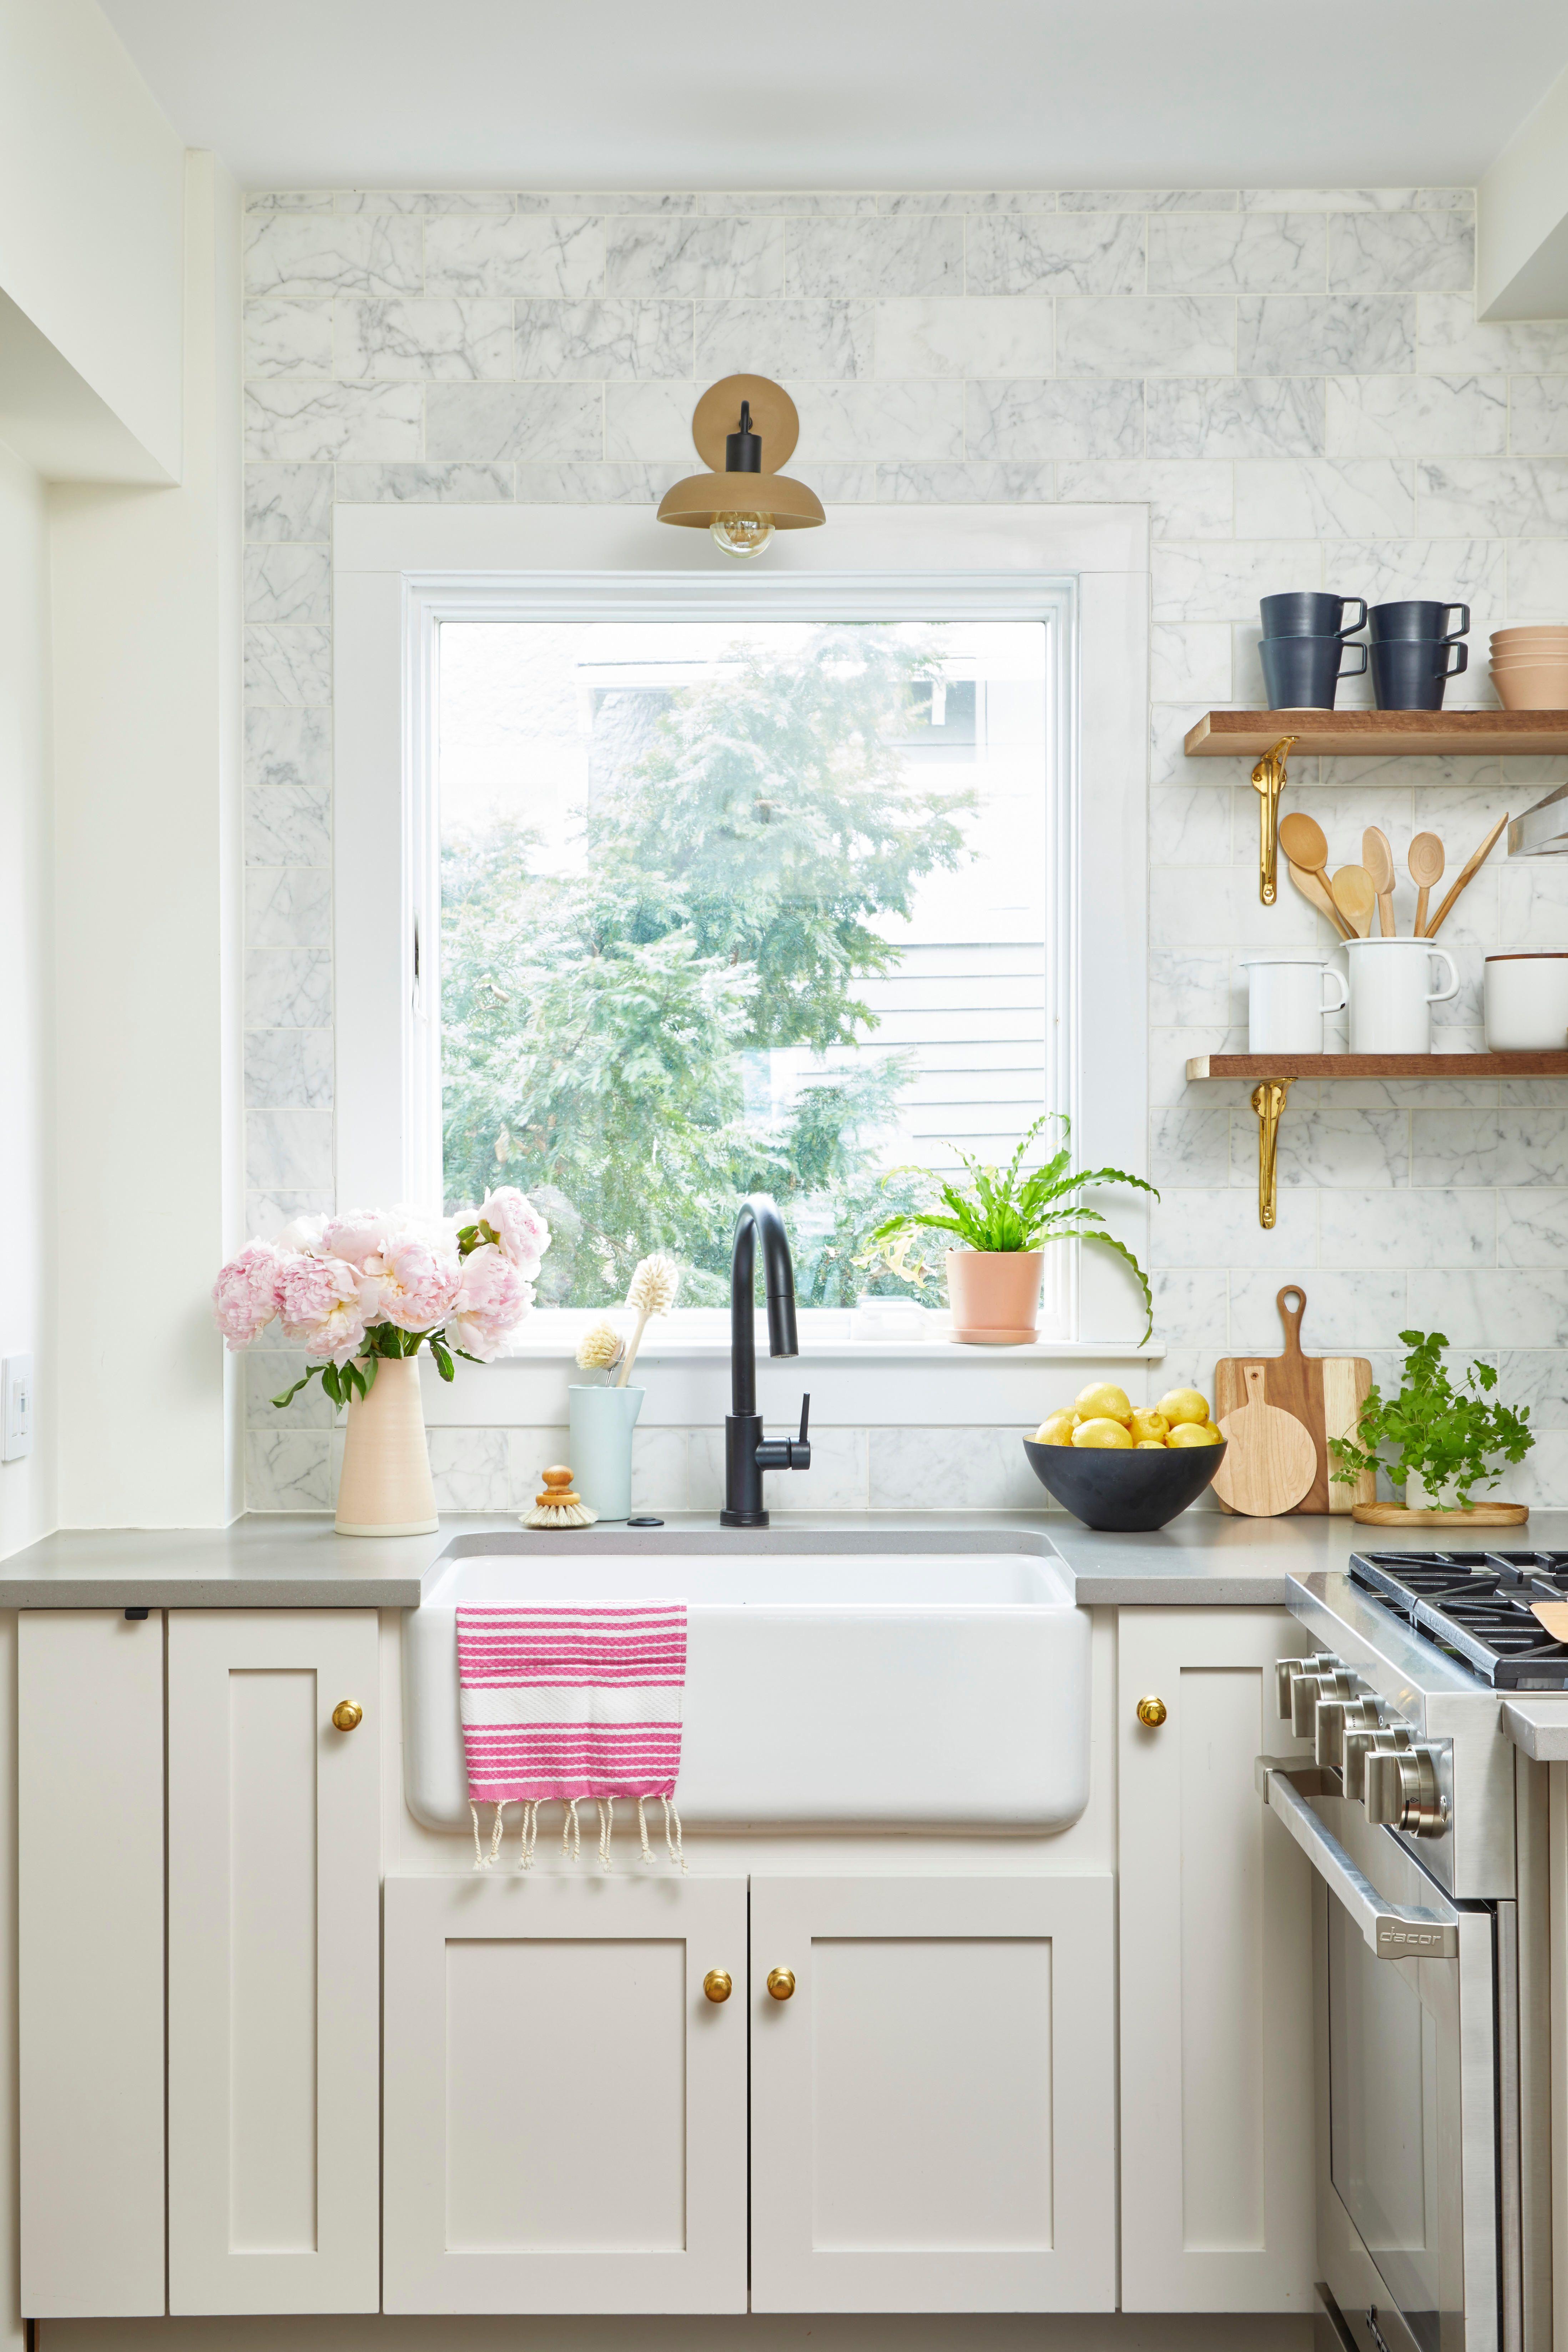 Merveilleux Decor Ideas Kitchen